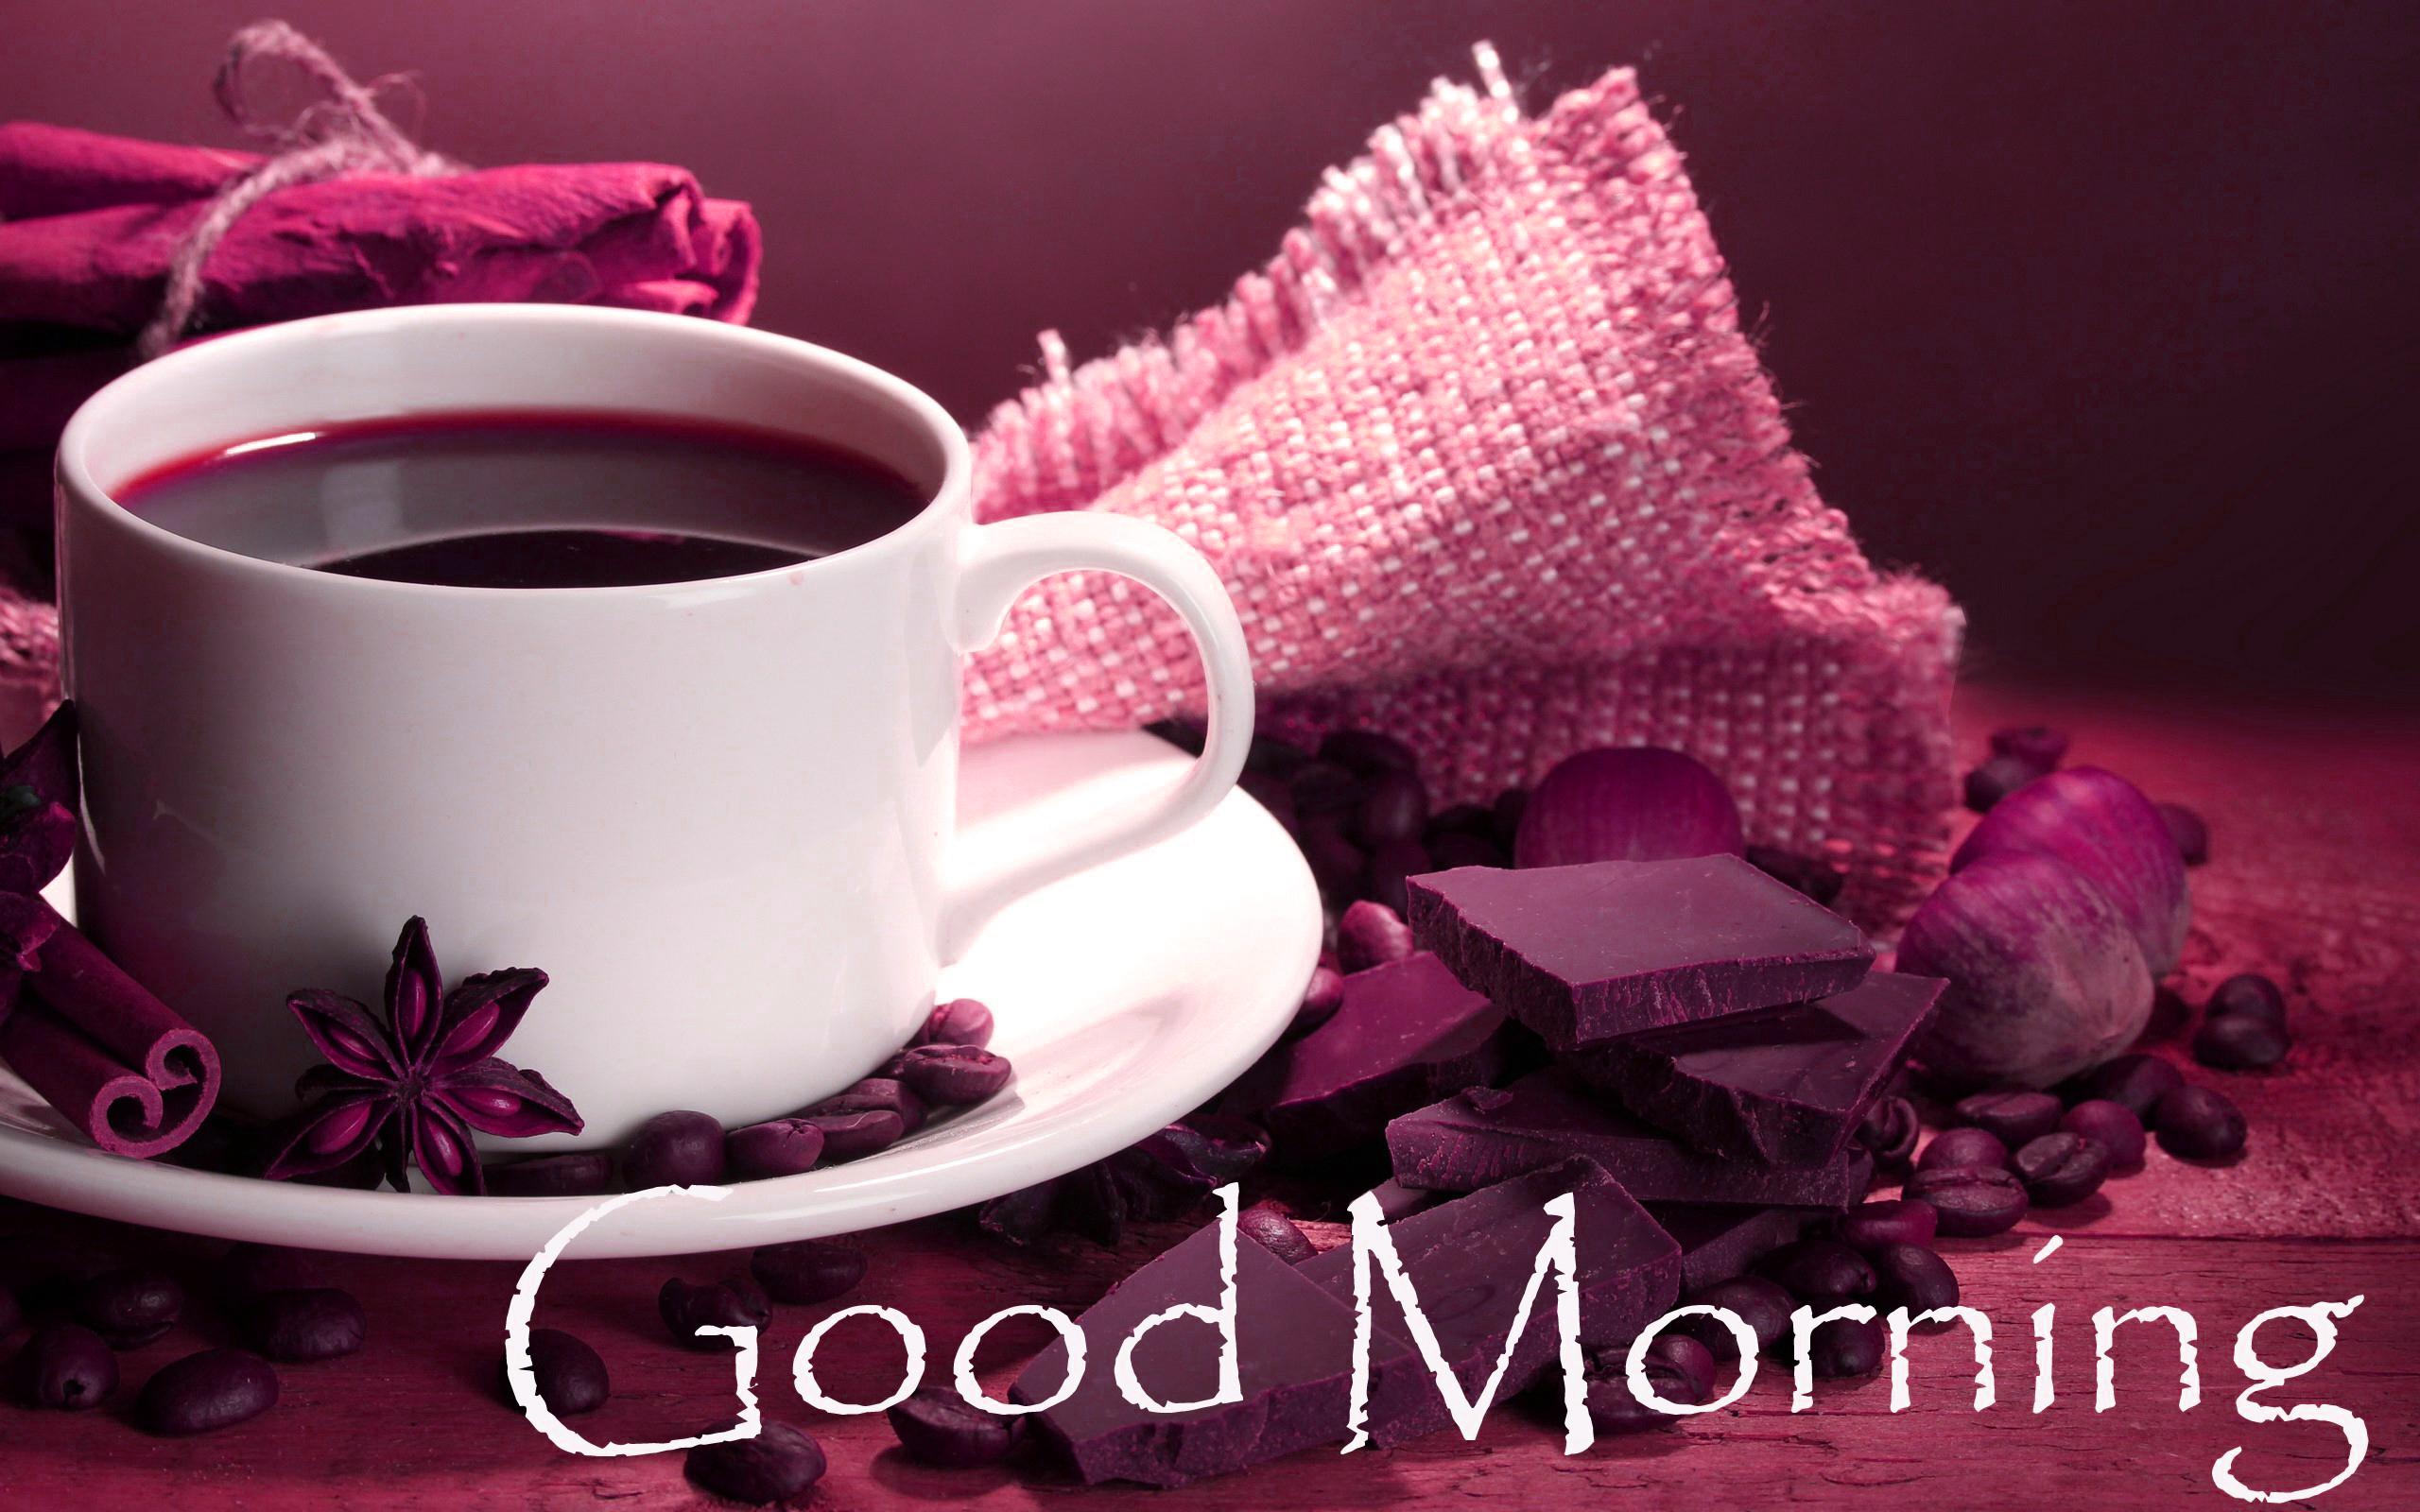 Wallpaper download good morning - Cute Good Morning Wallpaper